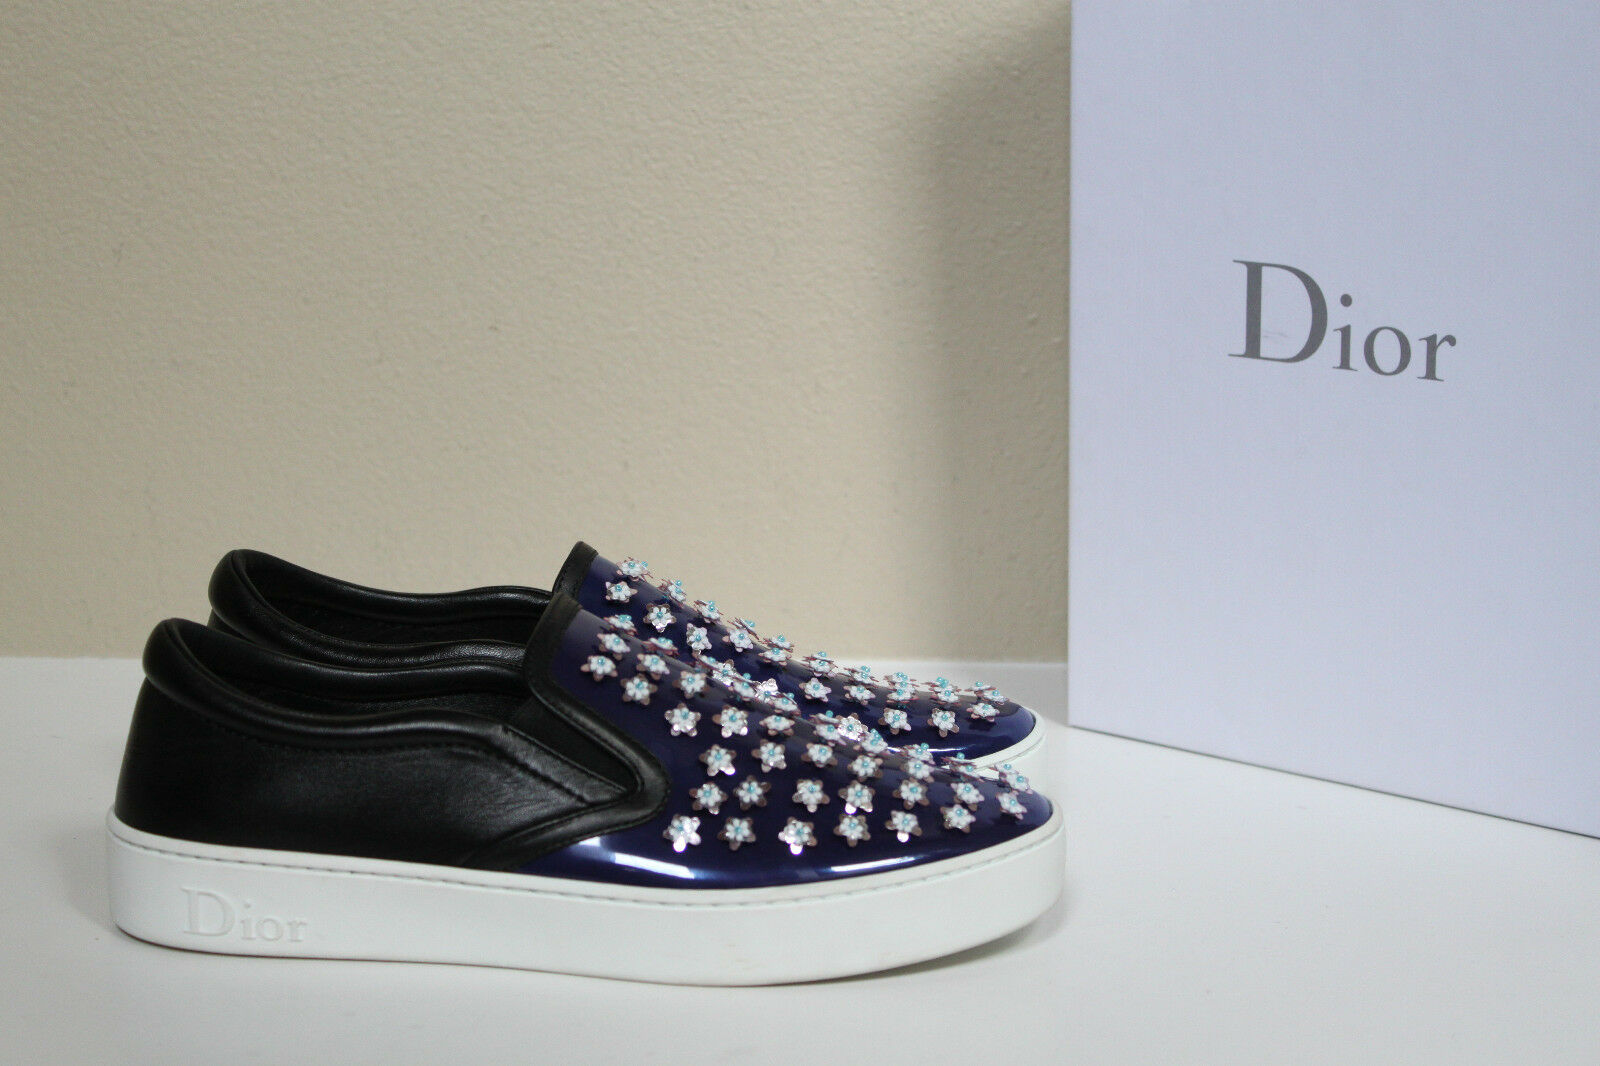 Rosie Assoulin 40.5 Donna Shoes Size 40.5 Assoulin NIB Flats Swarovski 008428